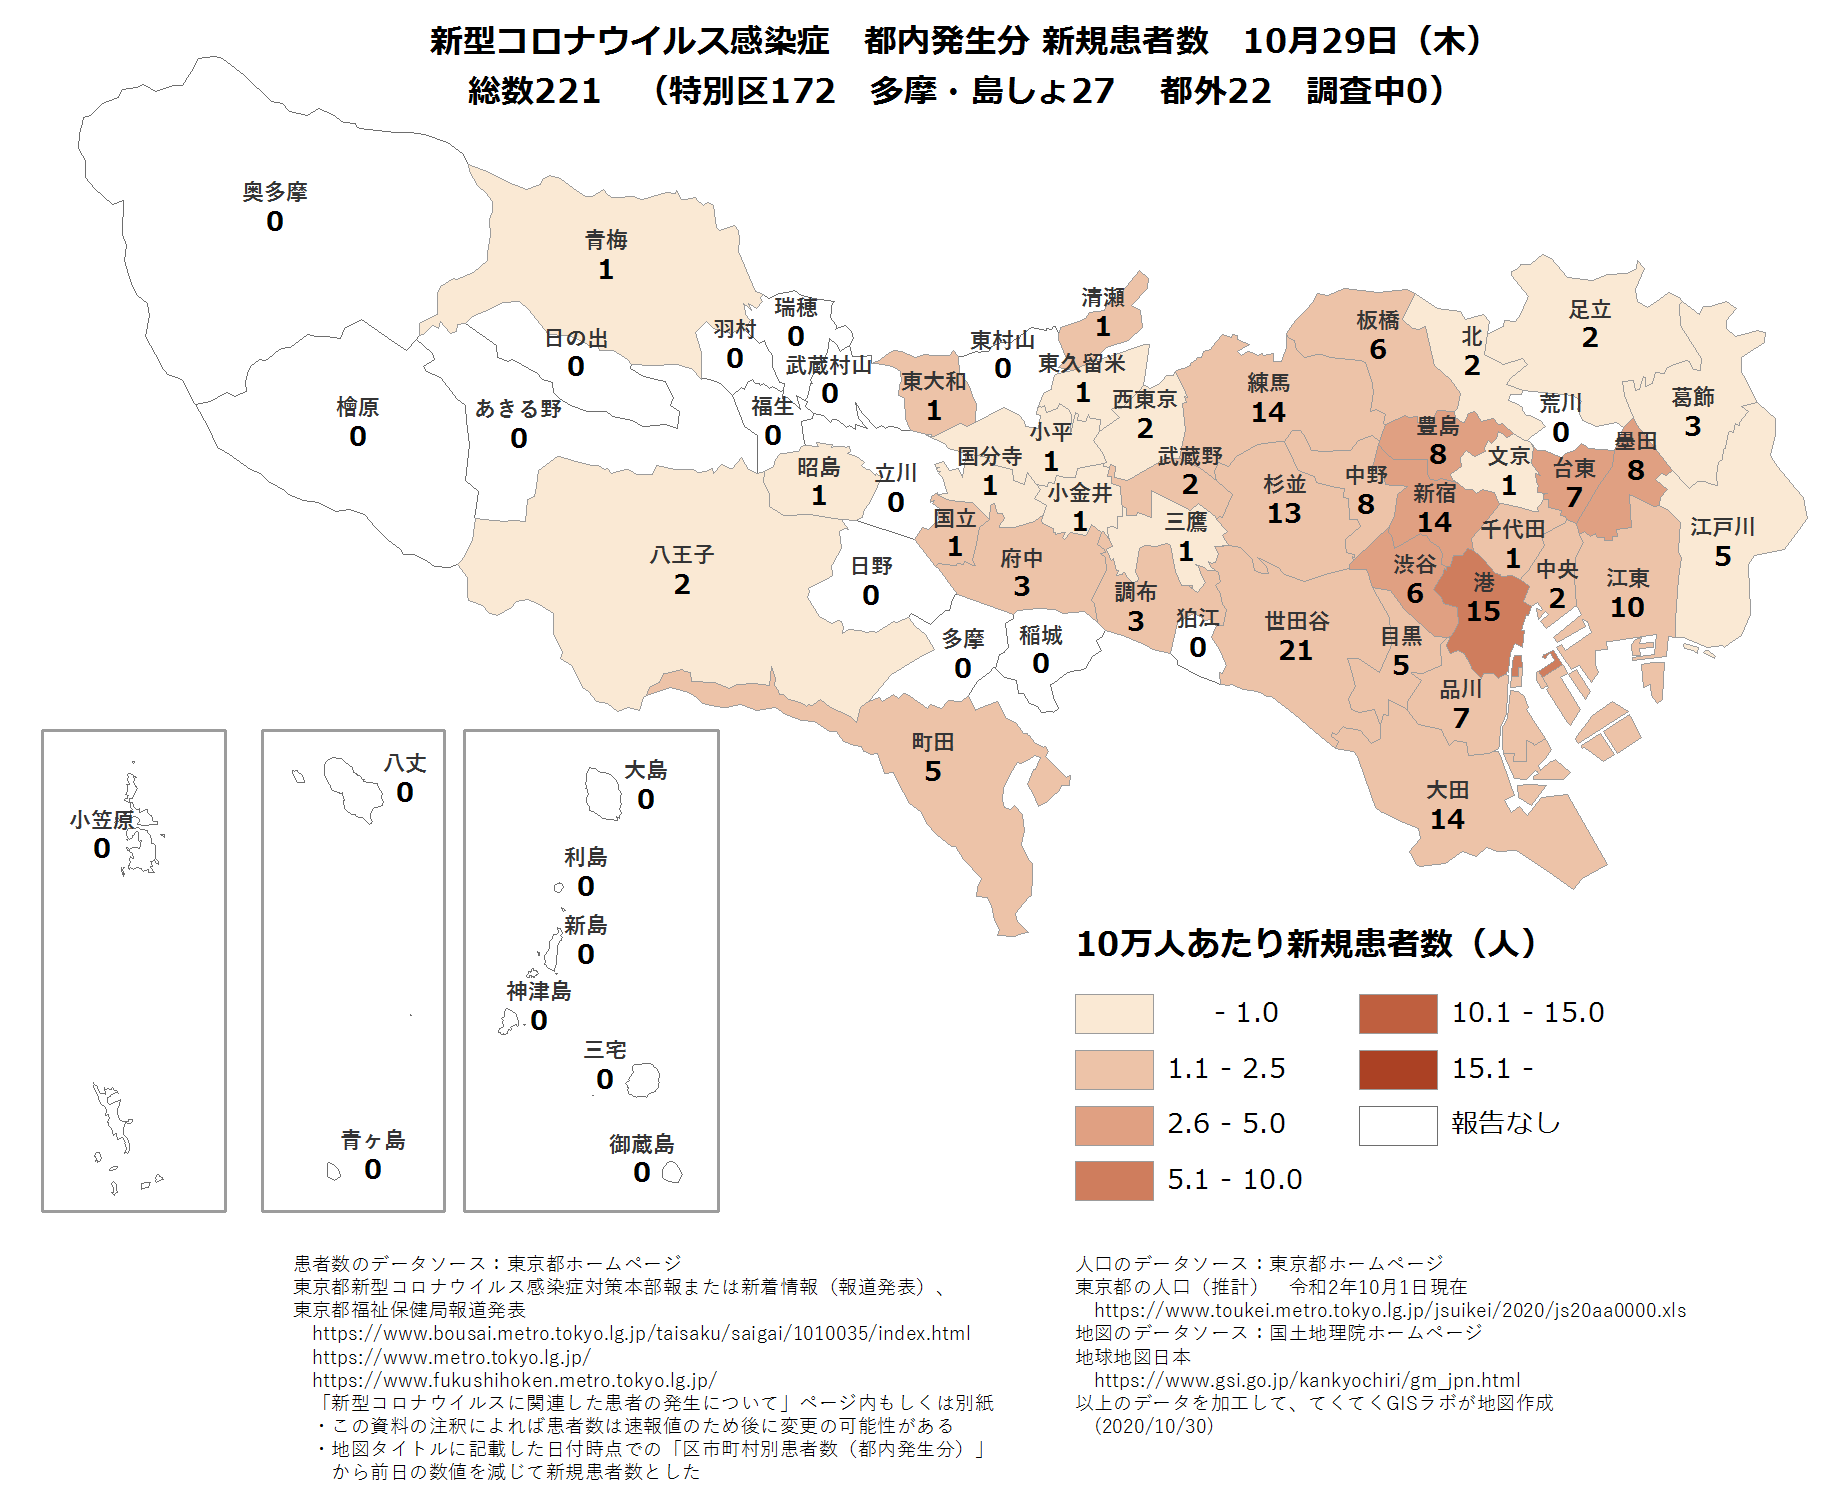 市区町村ごと新規患者数10月29日日東京